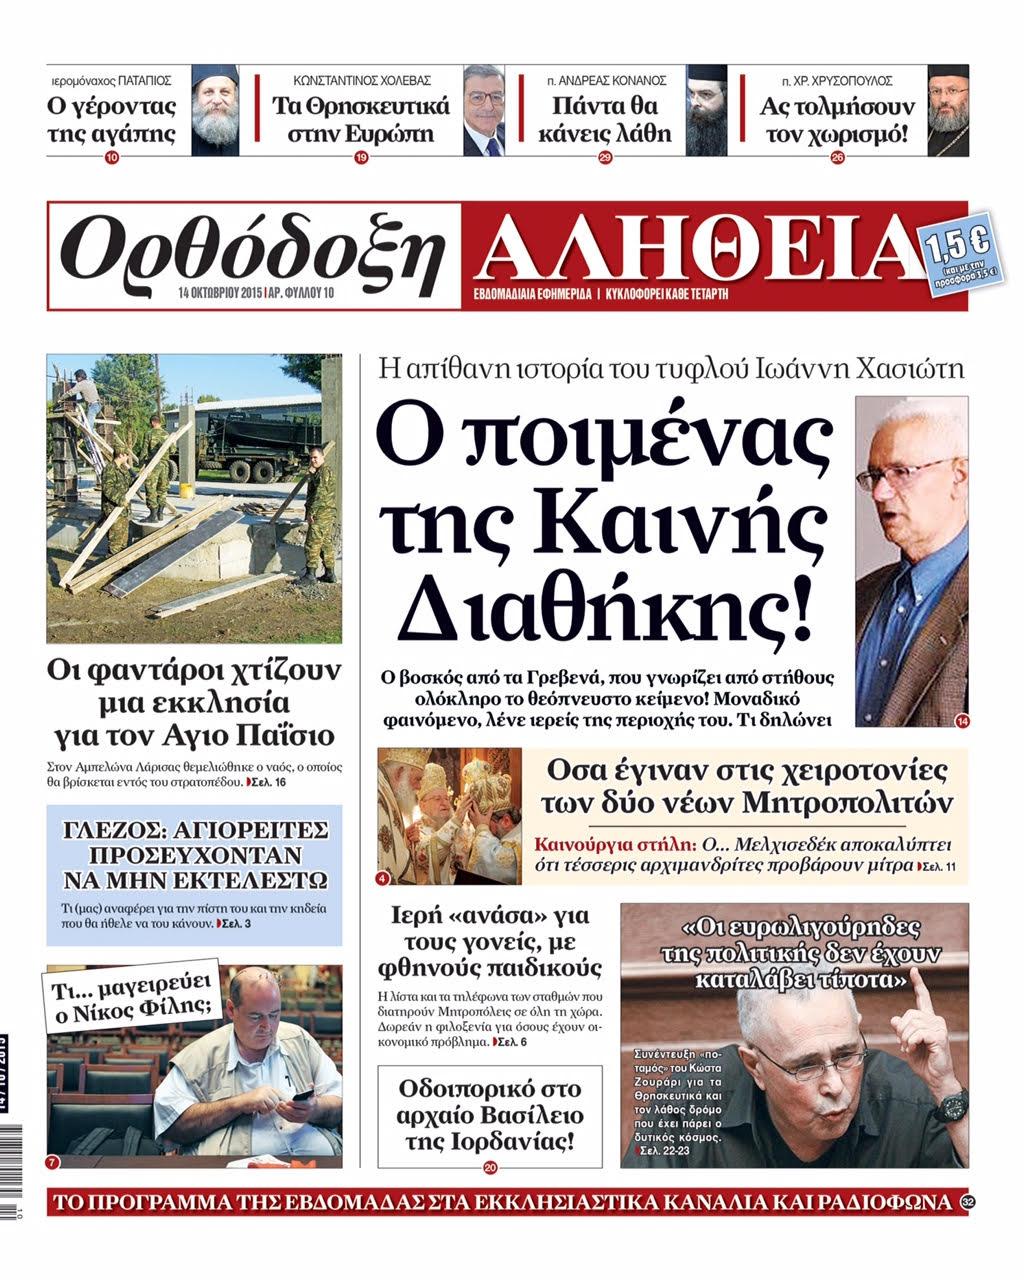 orthodox1.jpg